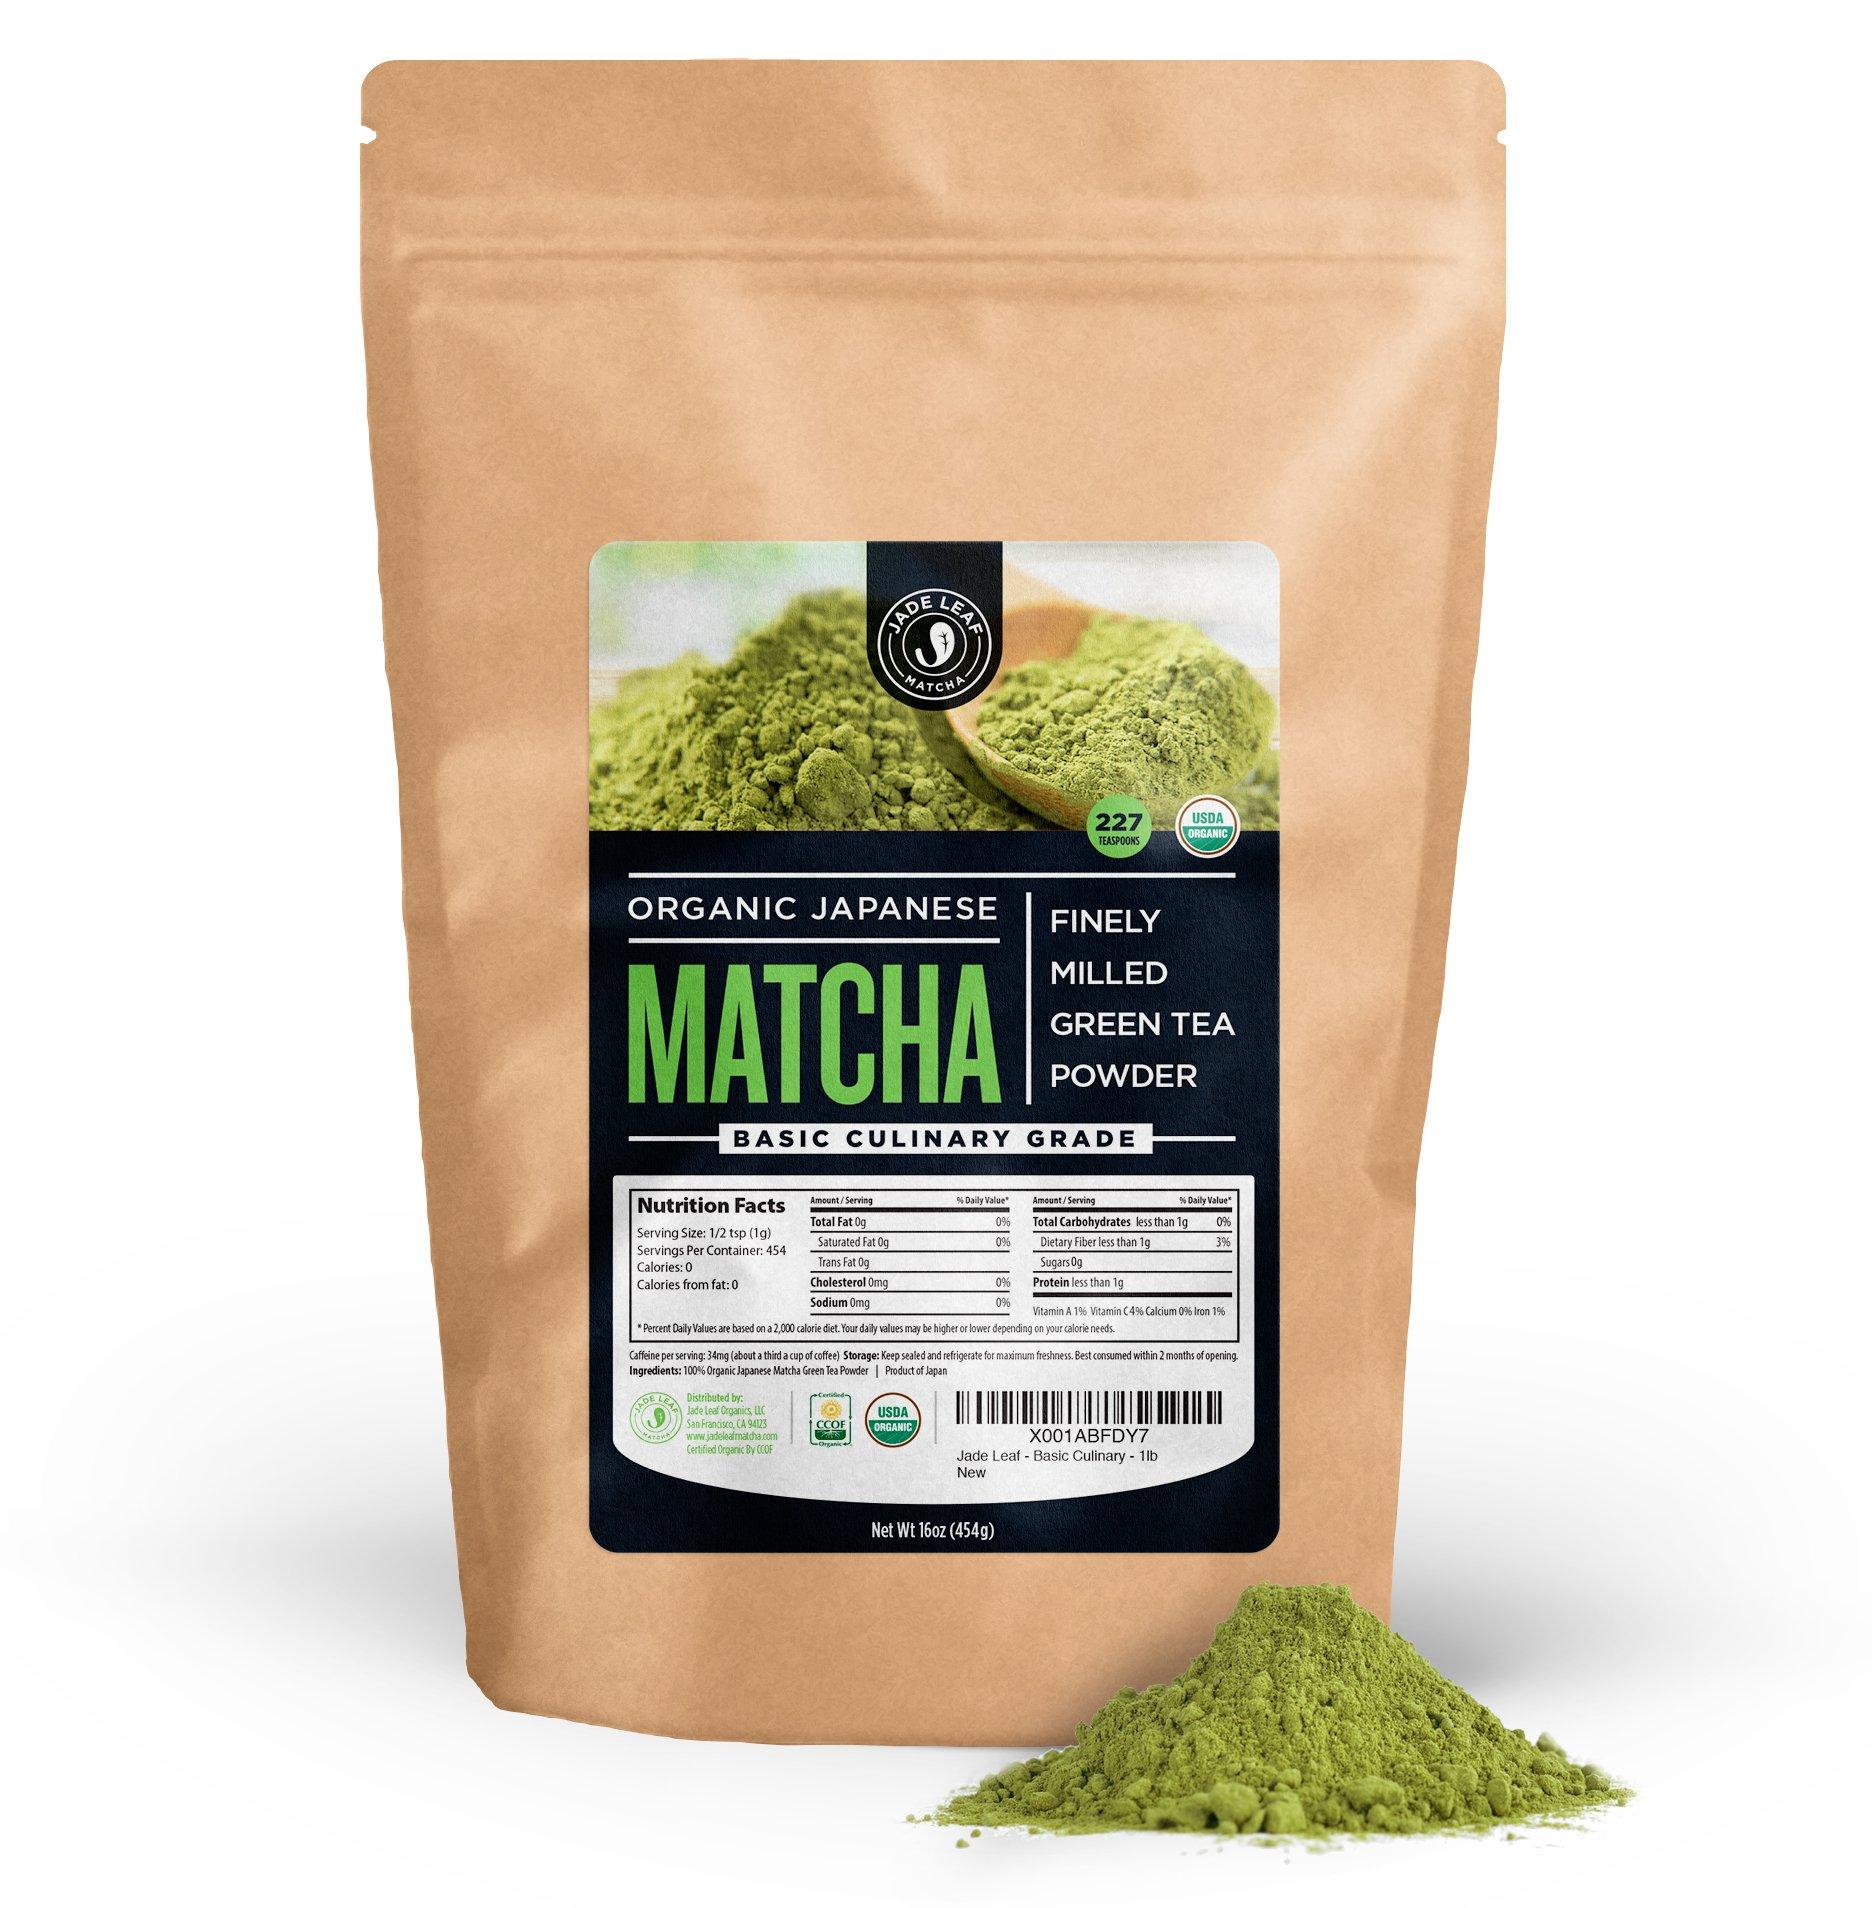 Jade Leaf - Organic Japanese Matcha Green Tea Powder, Basic Culinary Grade - [1lb Bulk Size]